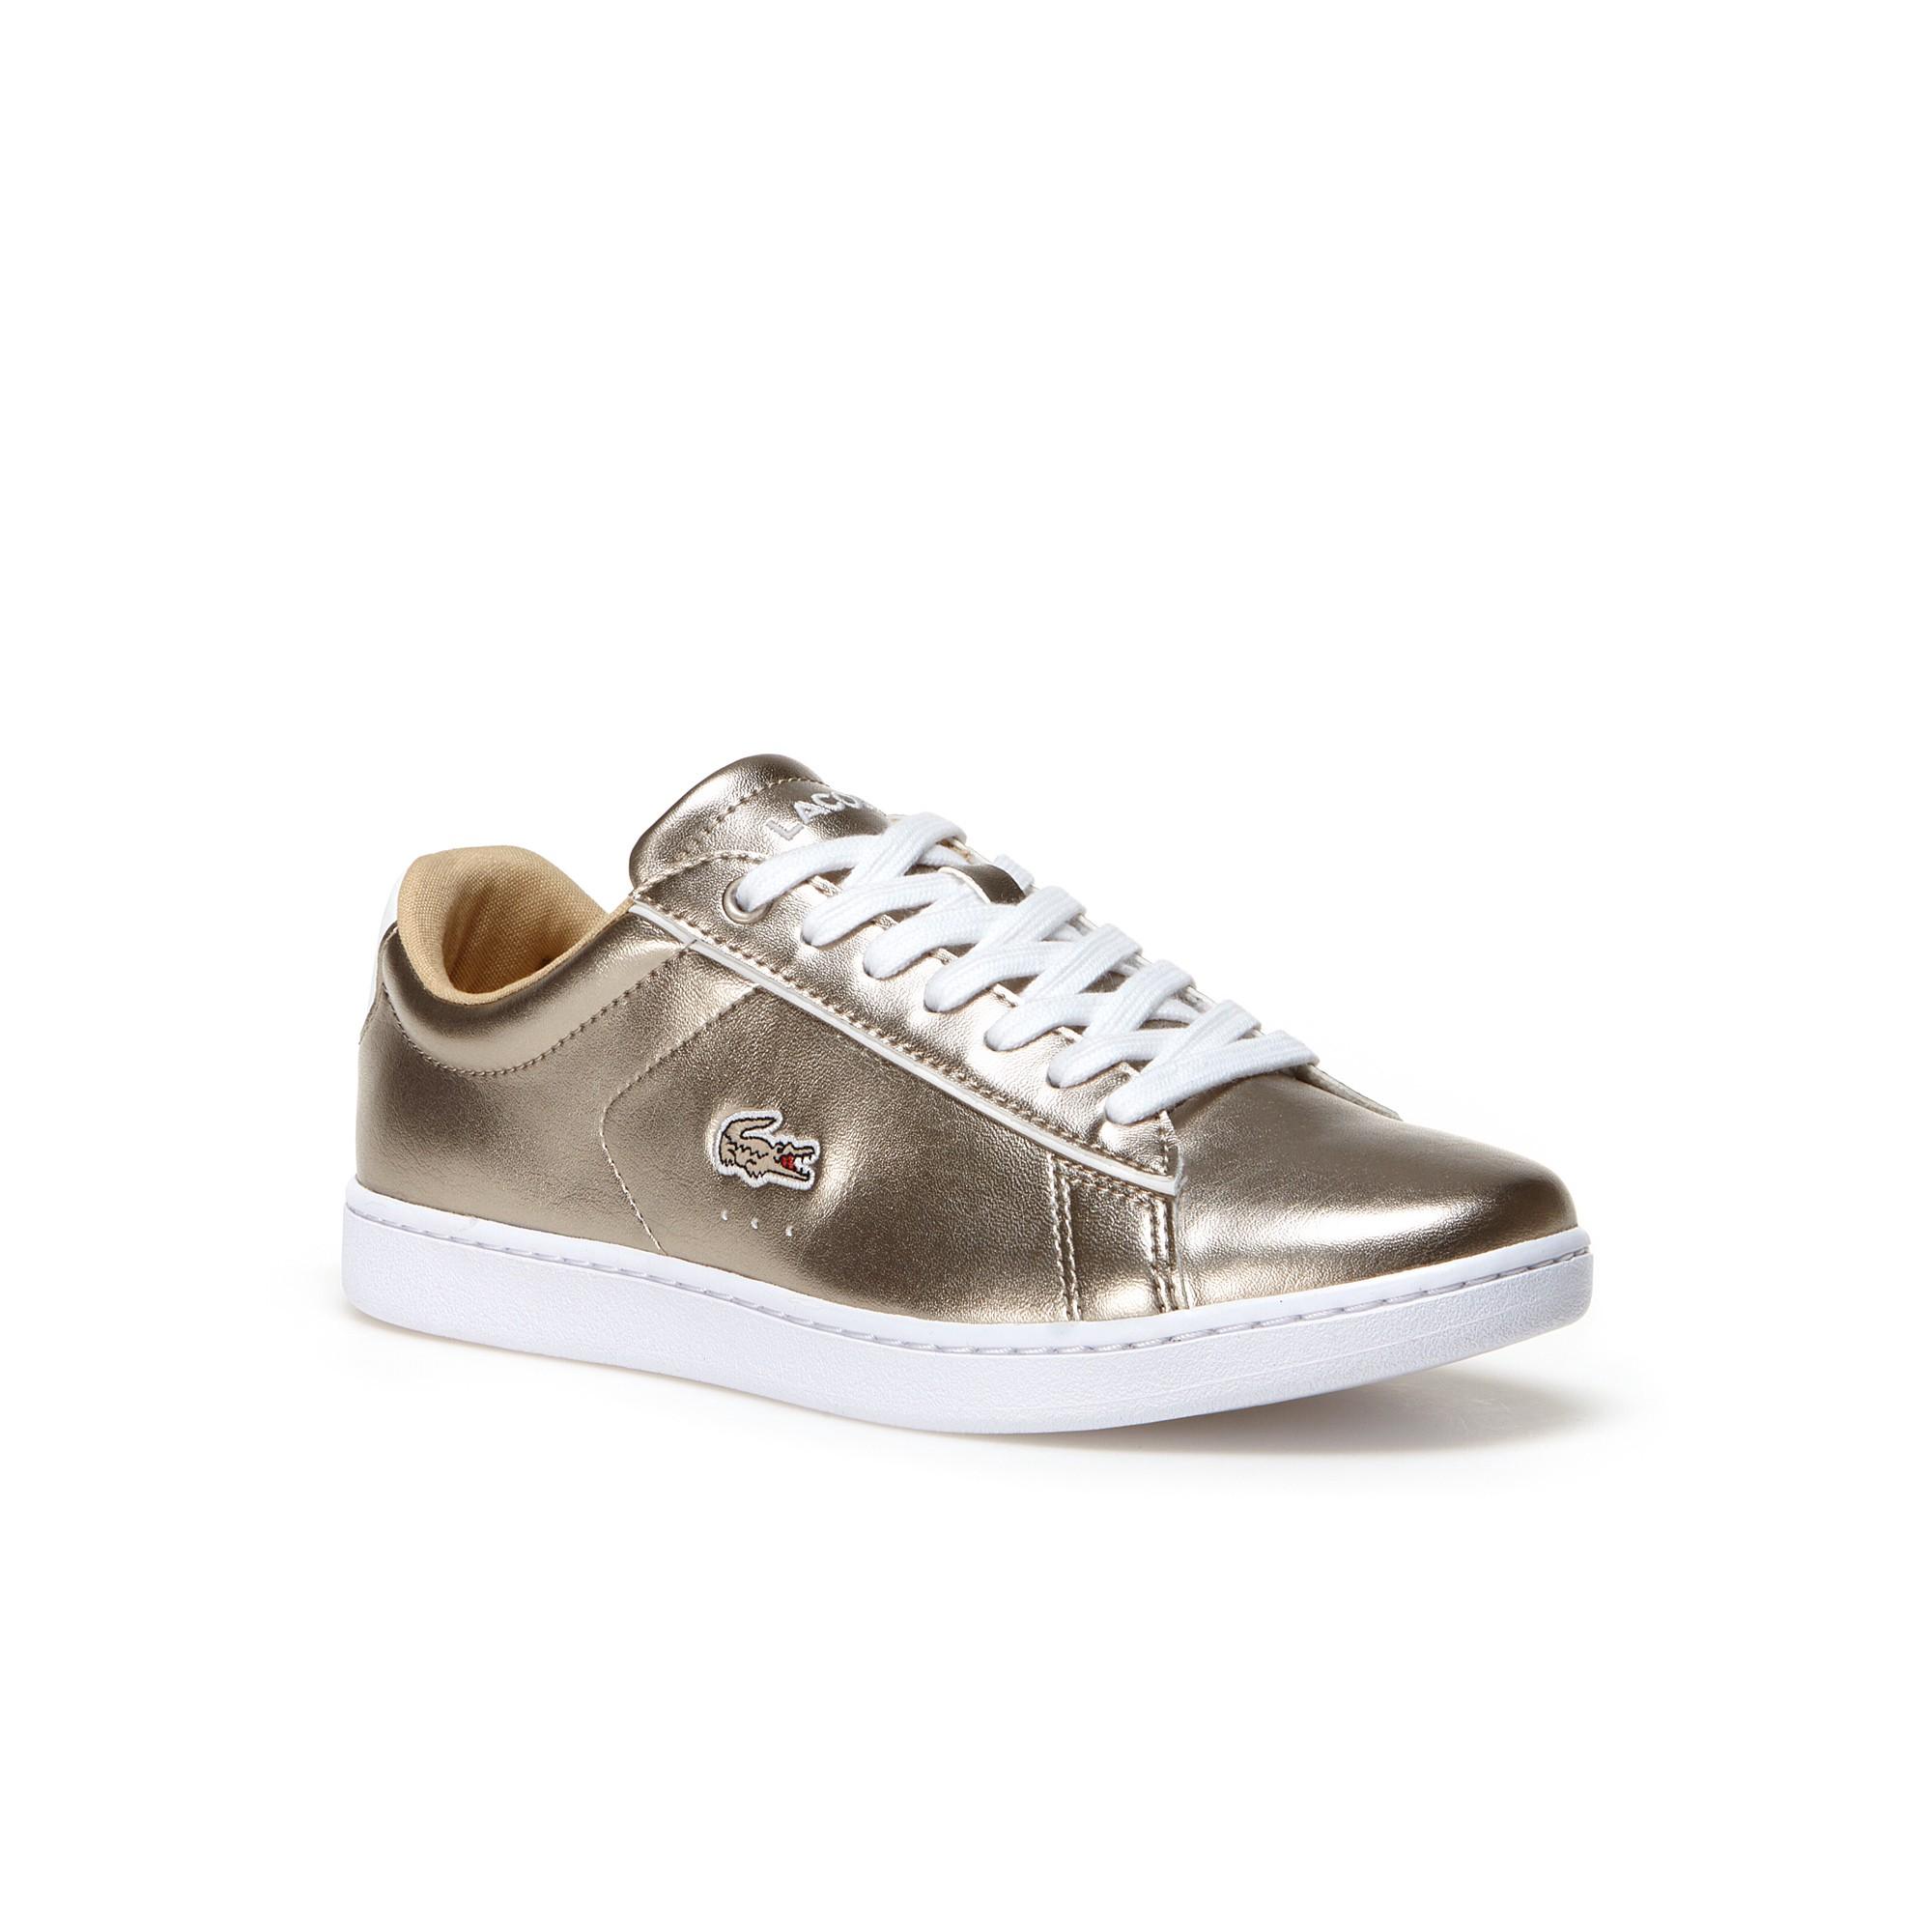 6a9662874ddf LACOSTE Women s Carnaby Evo Low-Rise Metallic Leather Sneakers - GREY.   lacoste